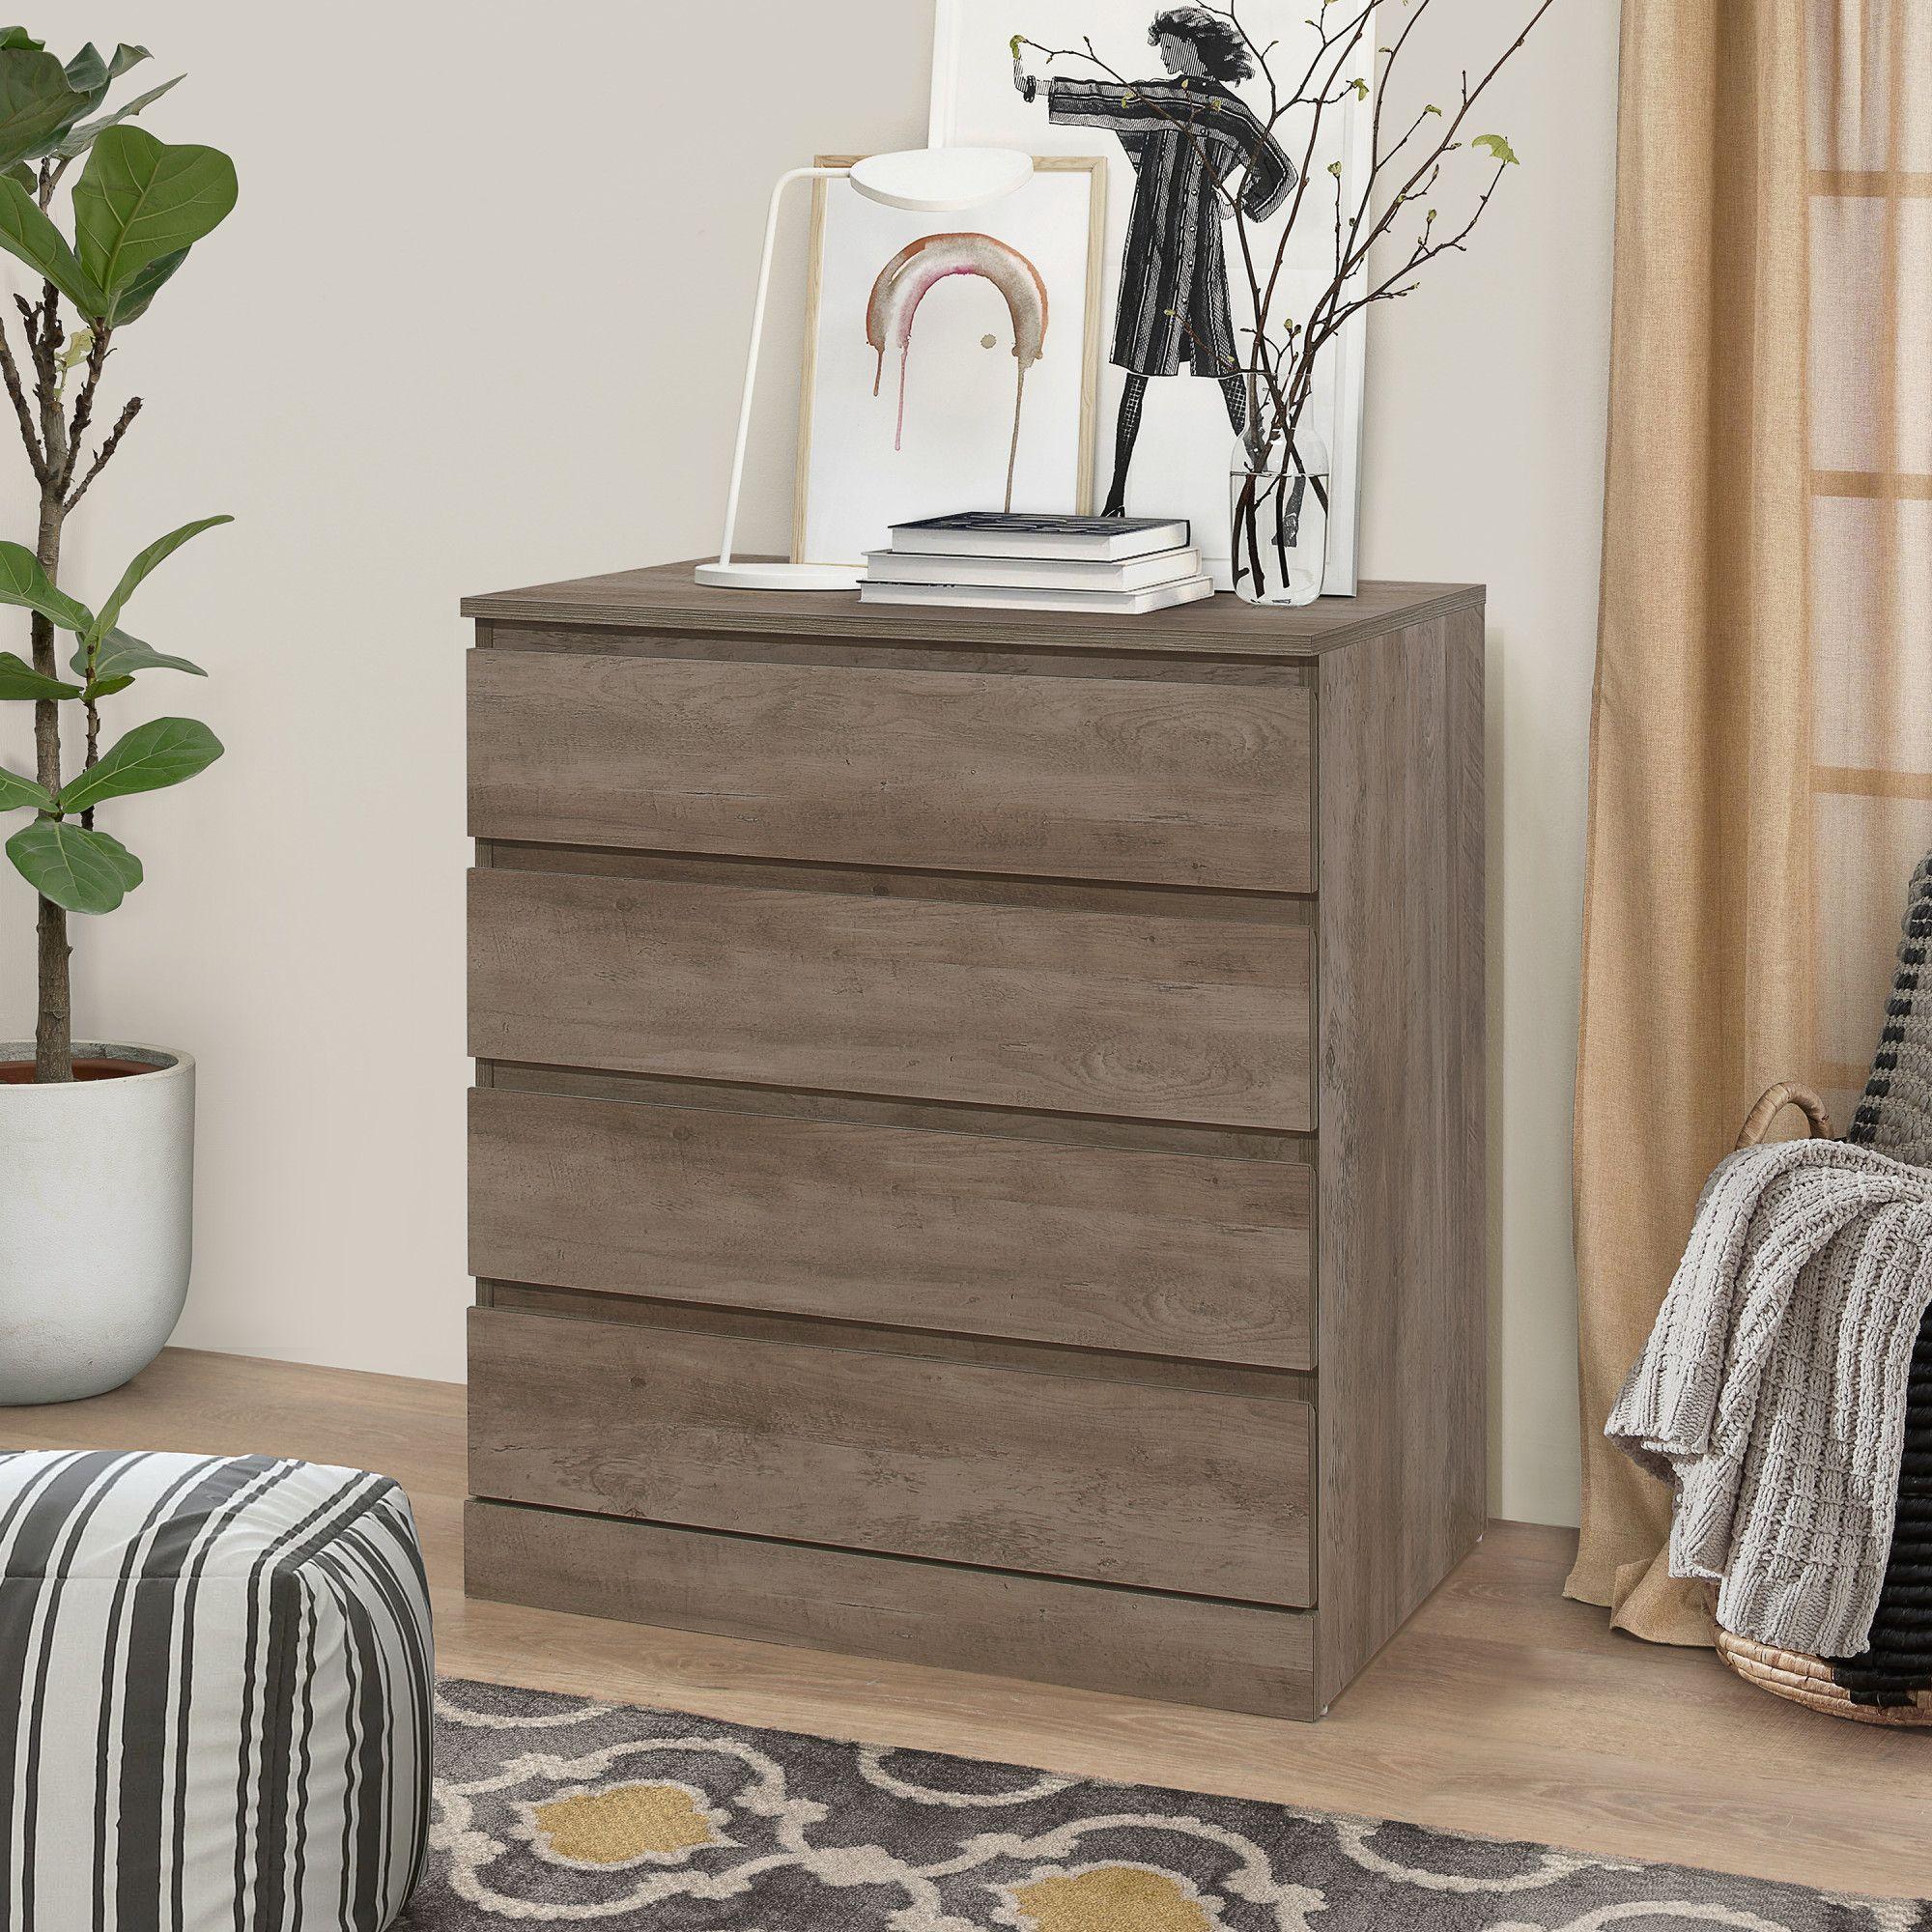 Brindle 4 Drawer Dresser Gray Oak By Hillsdale Living Essentials Walmart Com In 2021 4 Drawer Dresser Grey Oak Dresser Drawers [ 2000 x 2000 Pixel ]